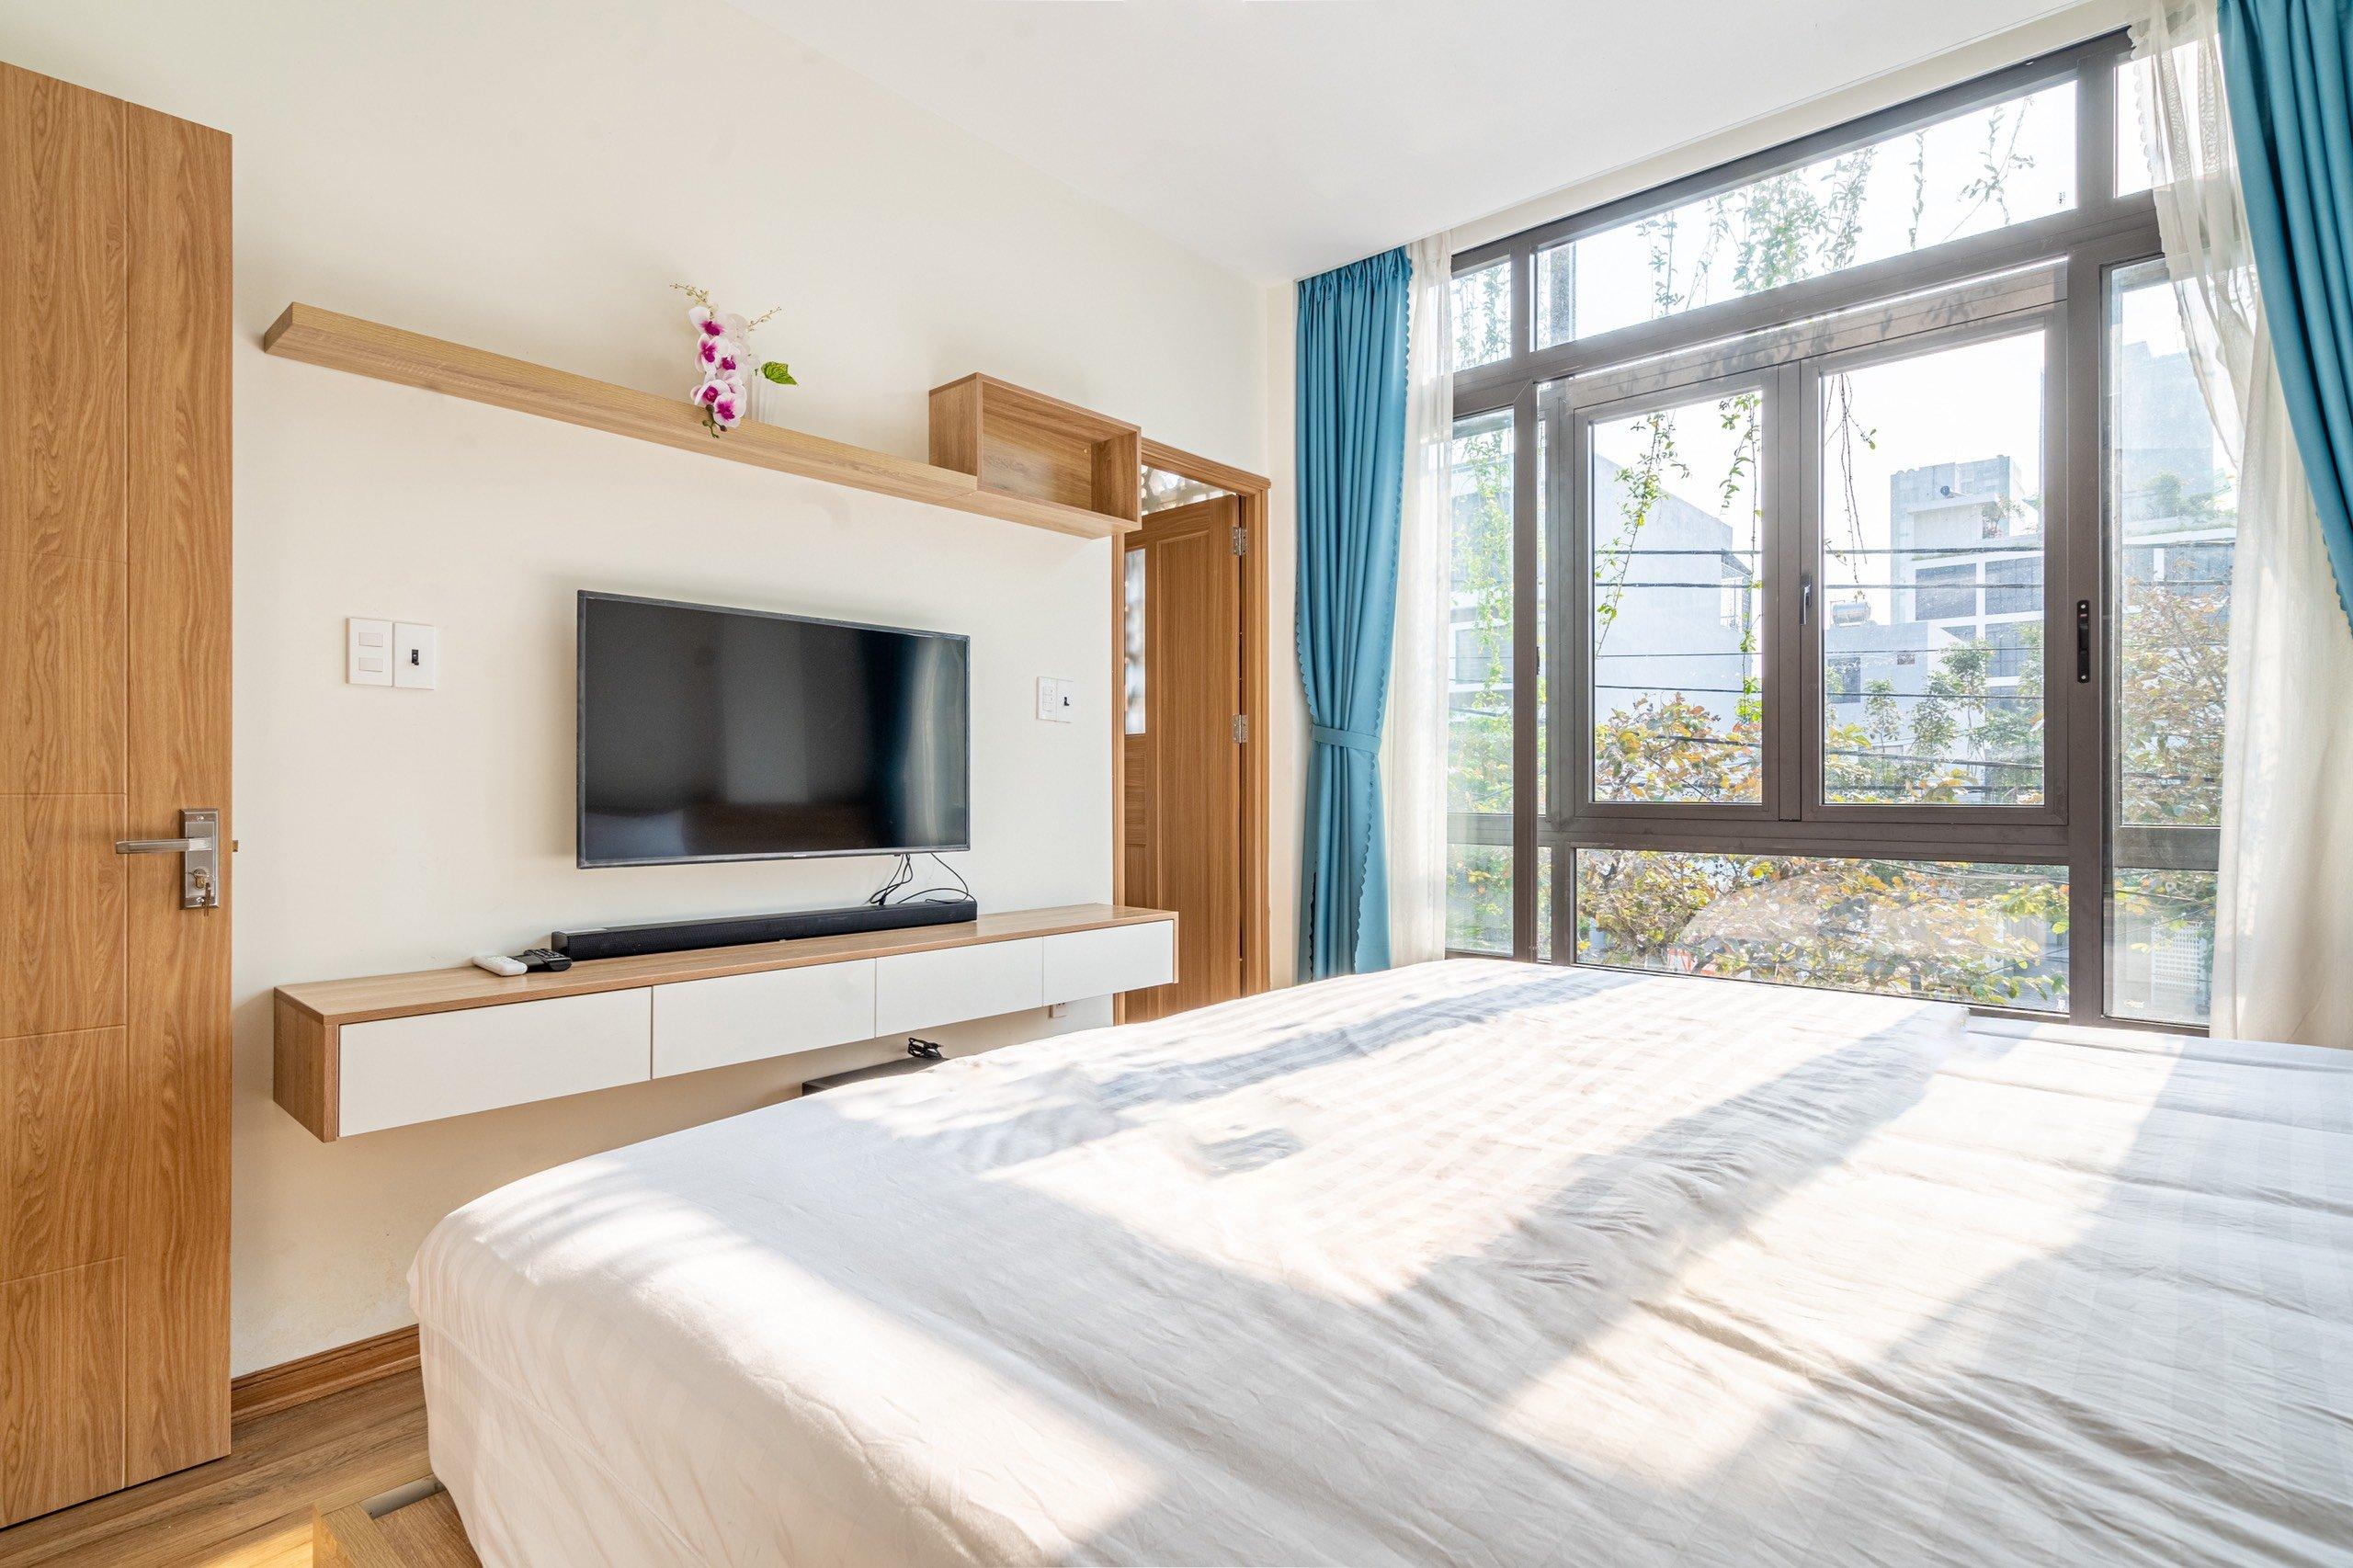 1 bed Apartment For Rent near Sheraton 4 Points Da Nang